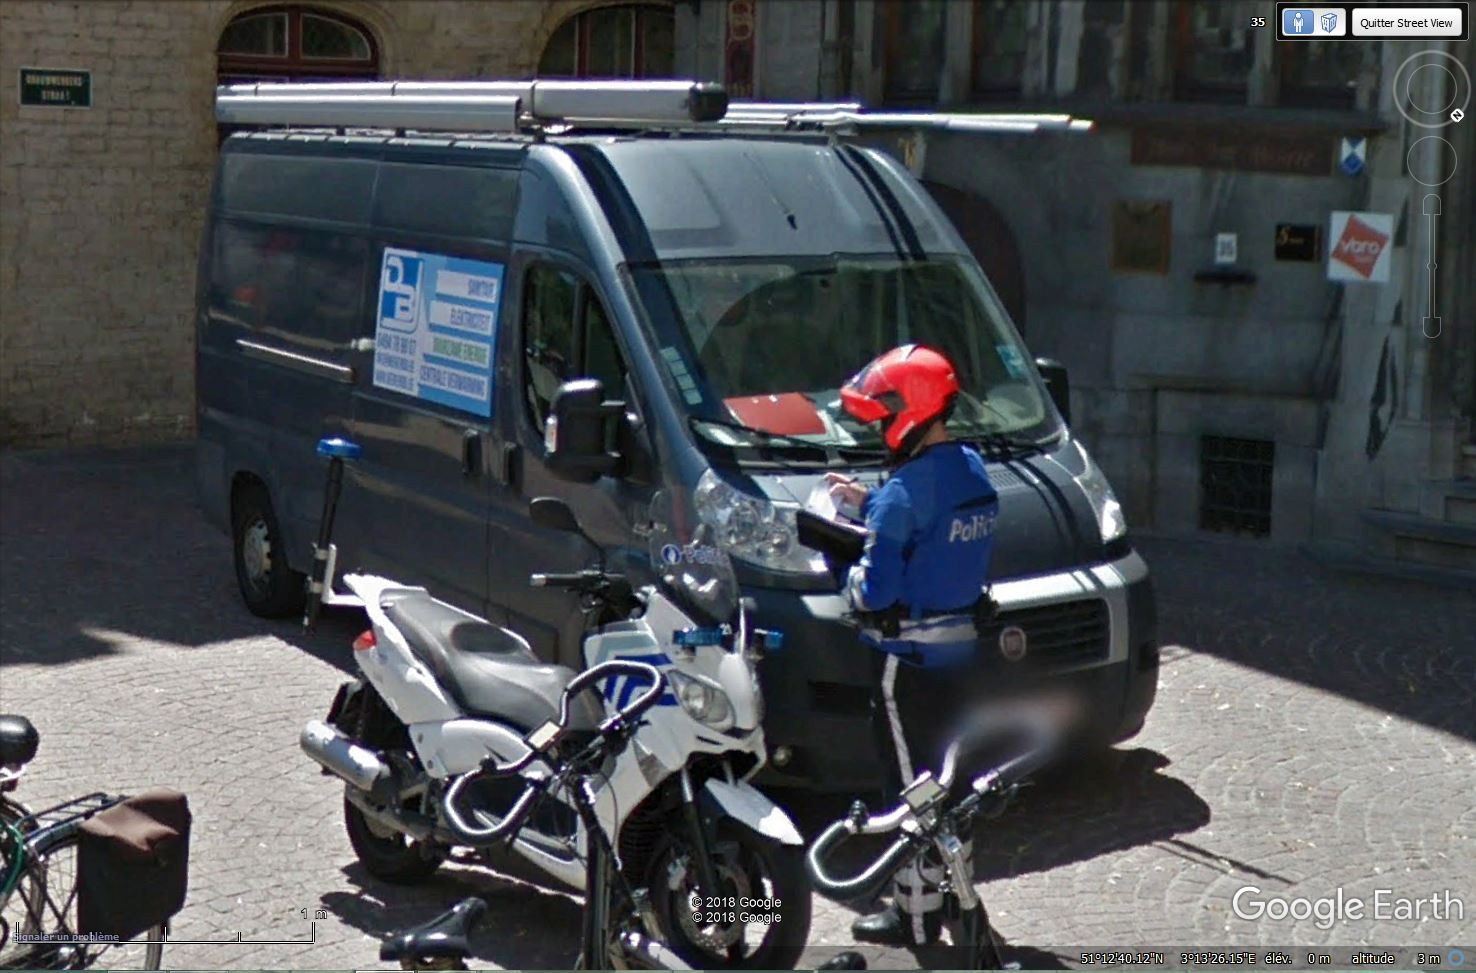 STREET VIEW : la Police en action - Page 3 Tsge_068